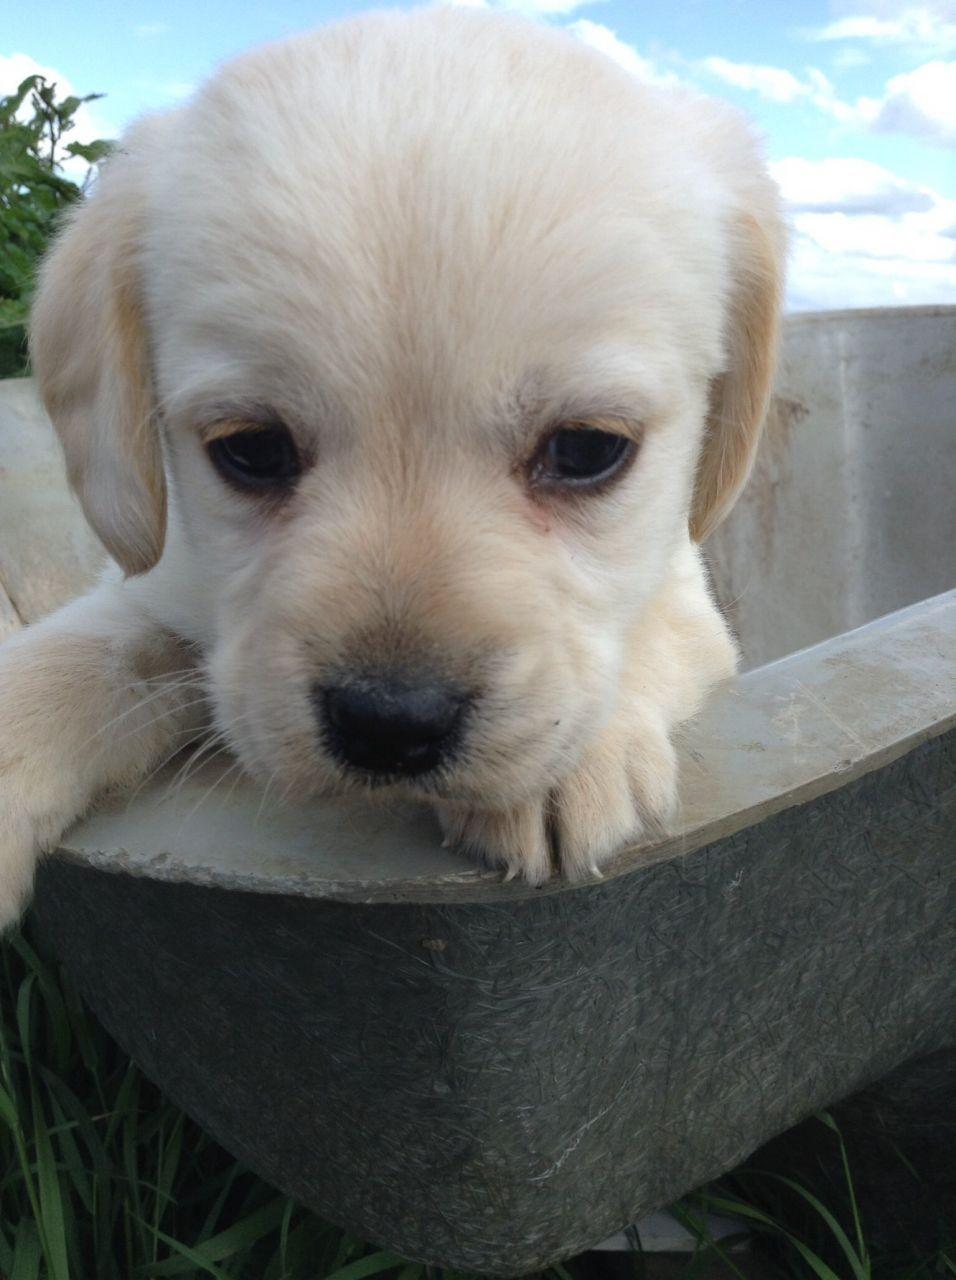 3 Adorable Cockerdor Pups For Sale Puppies For Sale Pup Pets